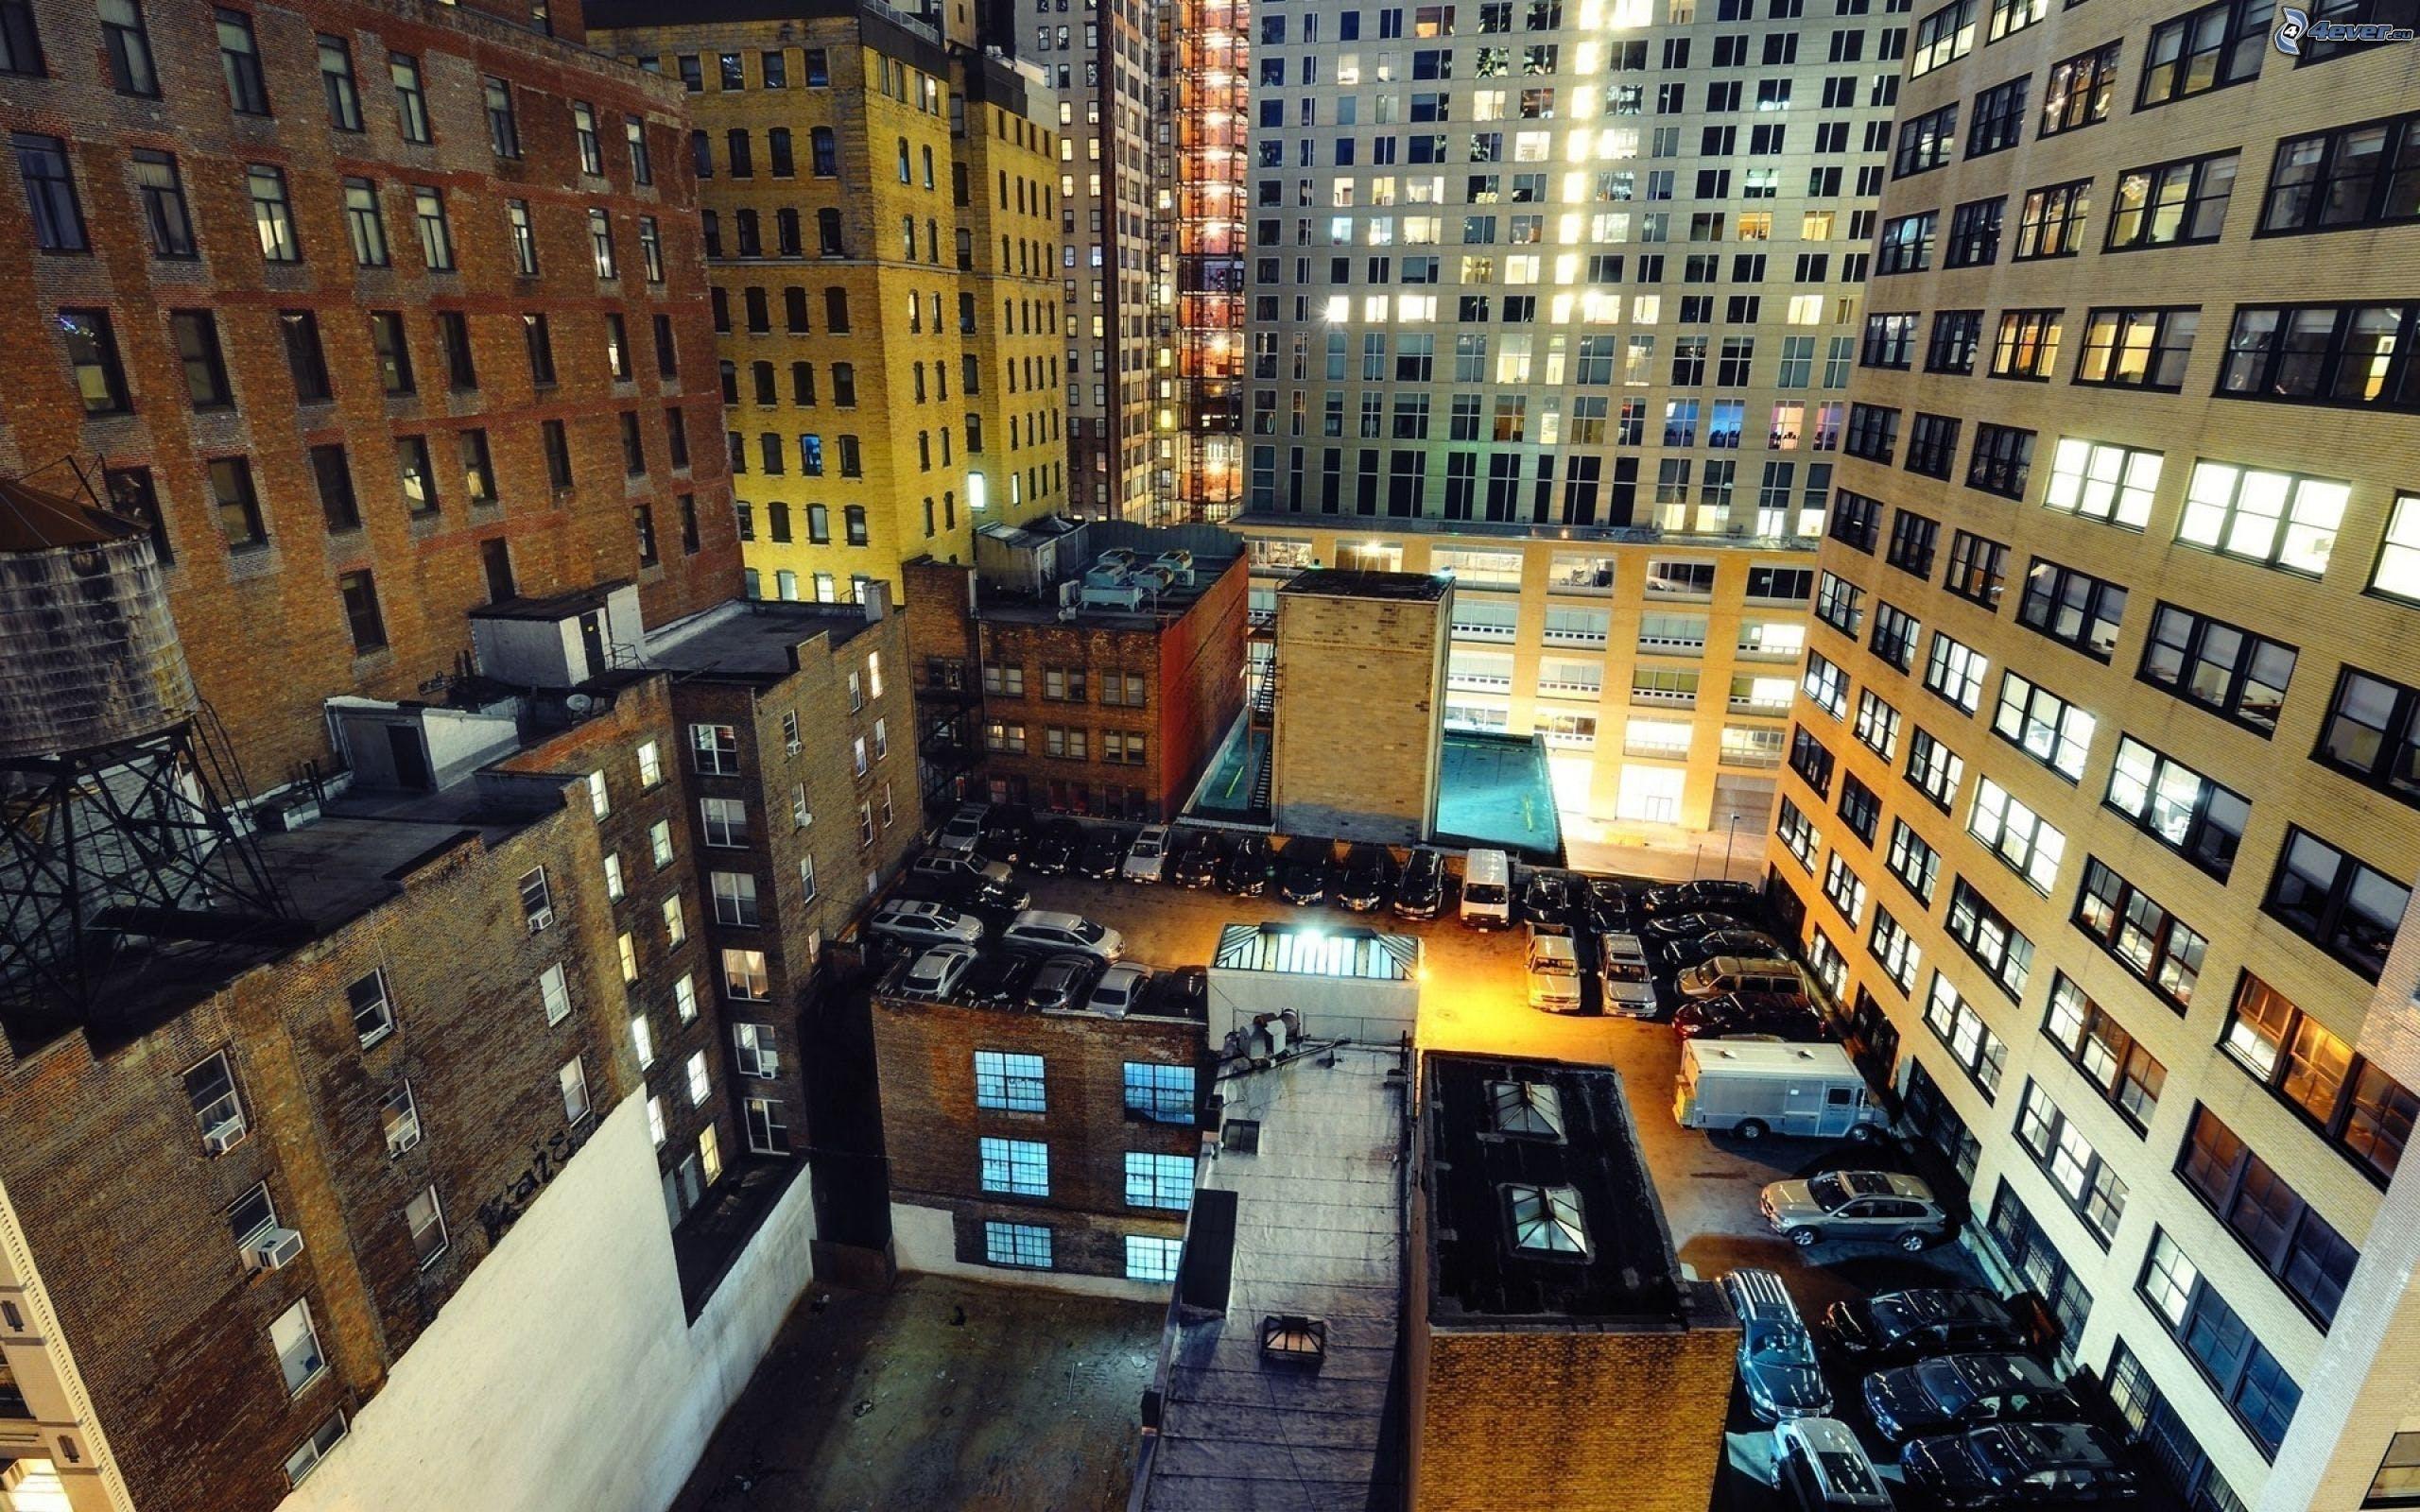 Free stock photo of urban scene